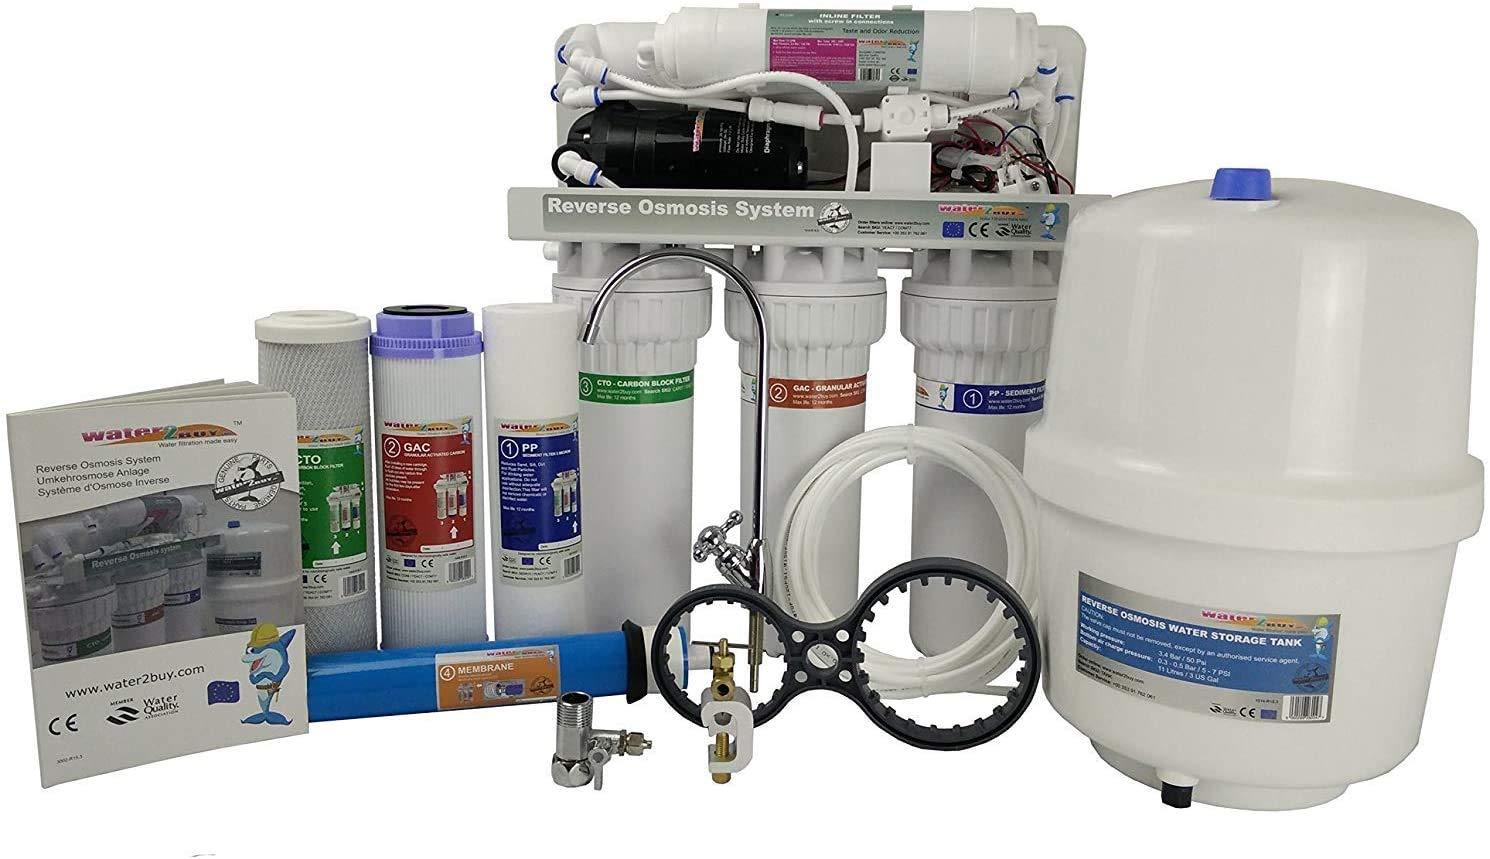 Water2buy Umkehrosmose RO600   5-stufige Umkehrosmoseanlage mit Pumpe: Amazon.de: Alle Produkte - Osmoseanlage kaufen